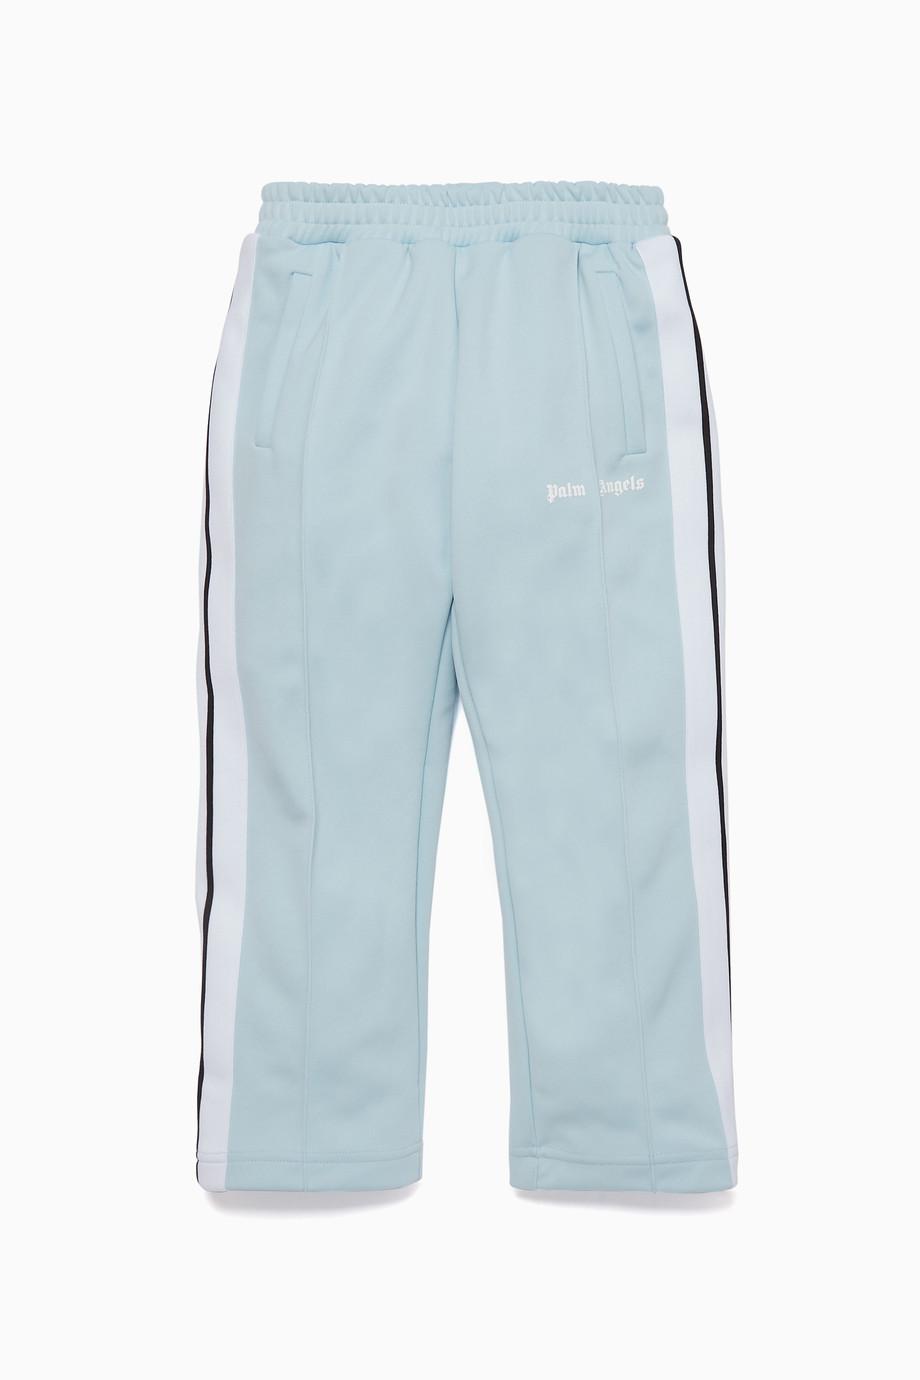 5467471183 Shop Palm Angels Blue Light-Blue Classic Track Pants for Kids ...